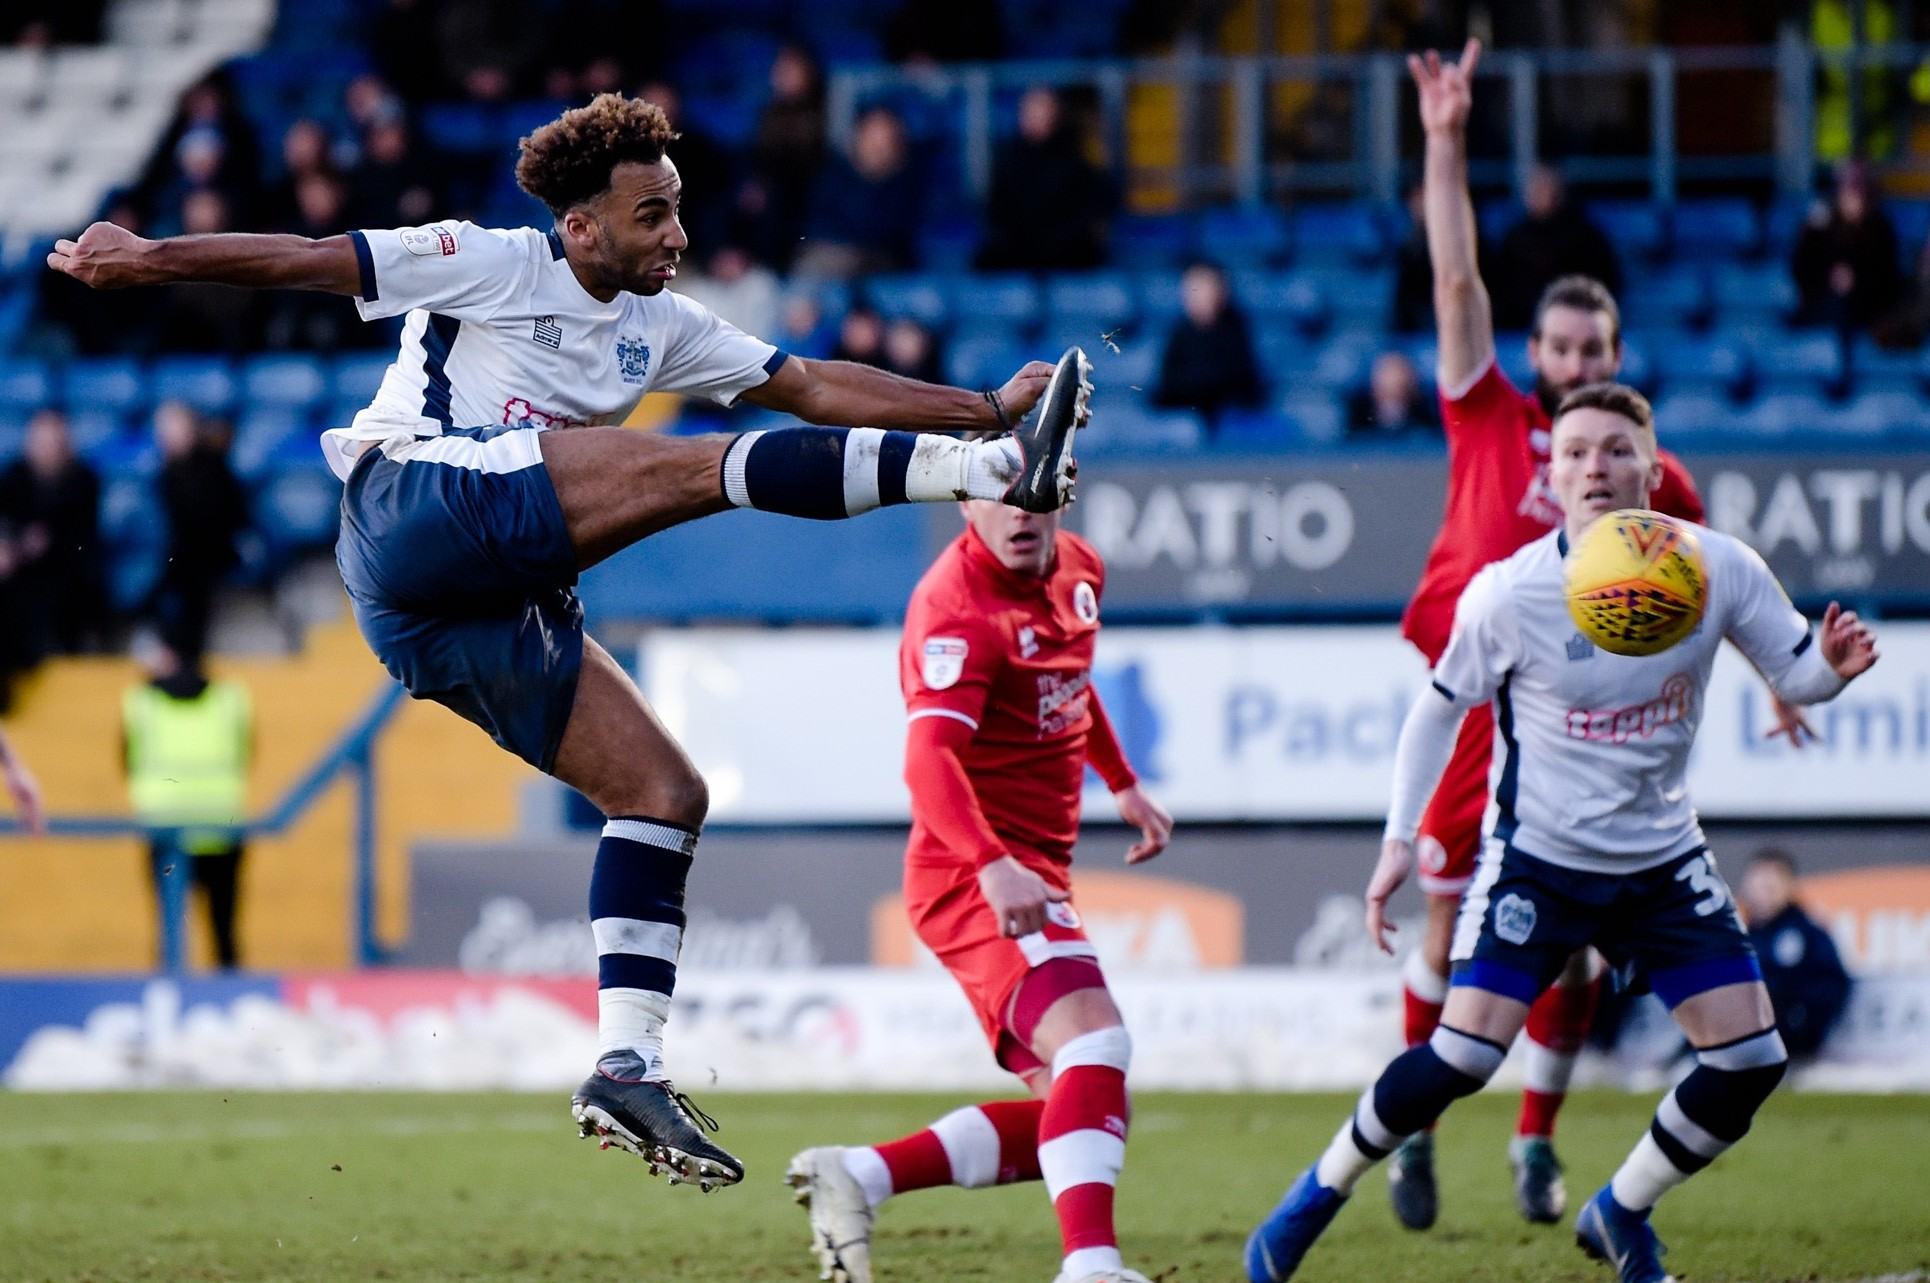 Below-par Bury drop points as Crawley snatch a draw late on